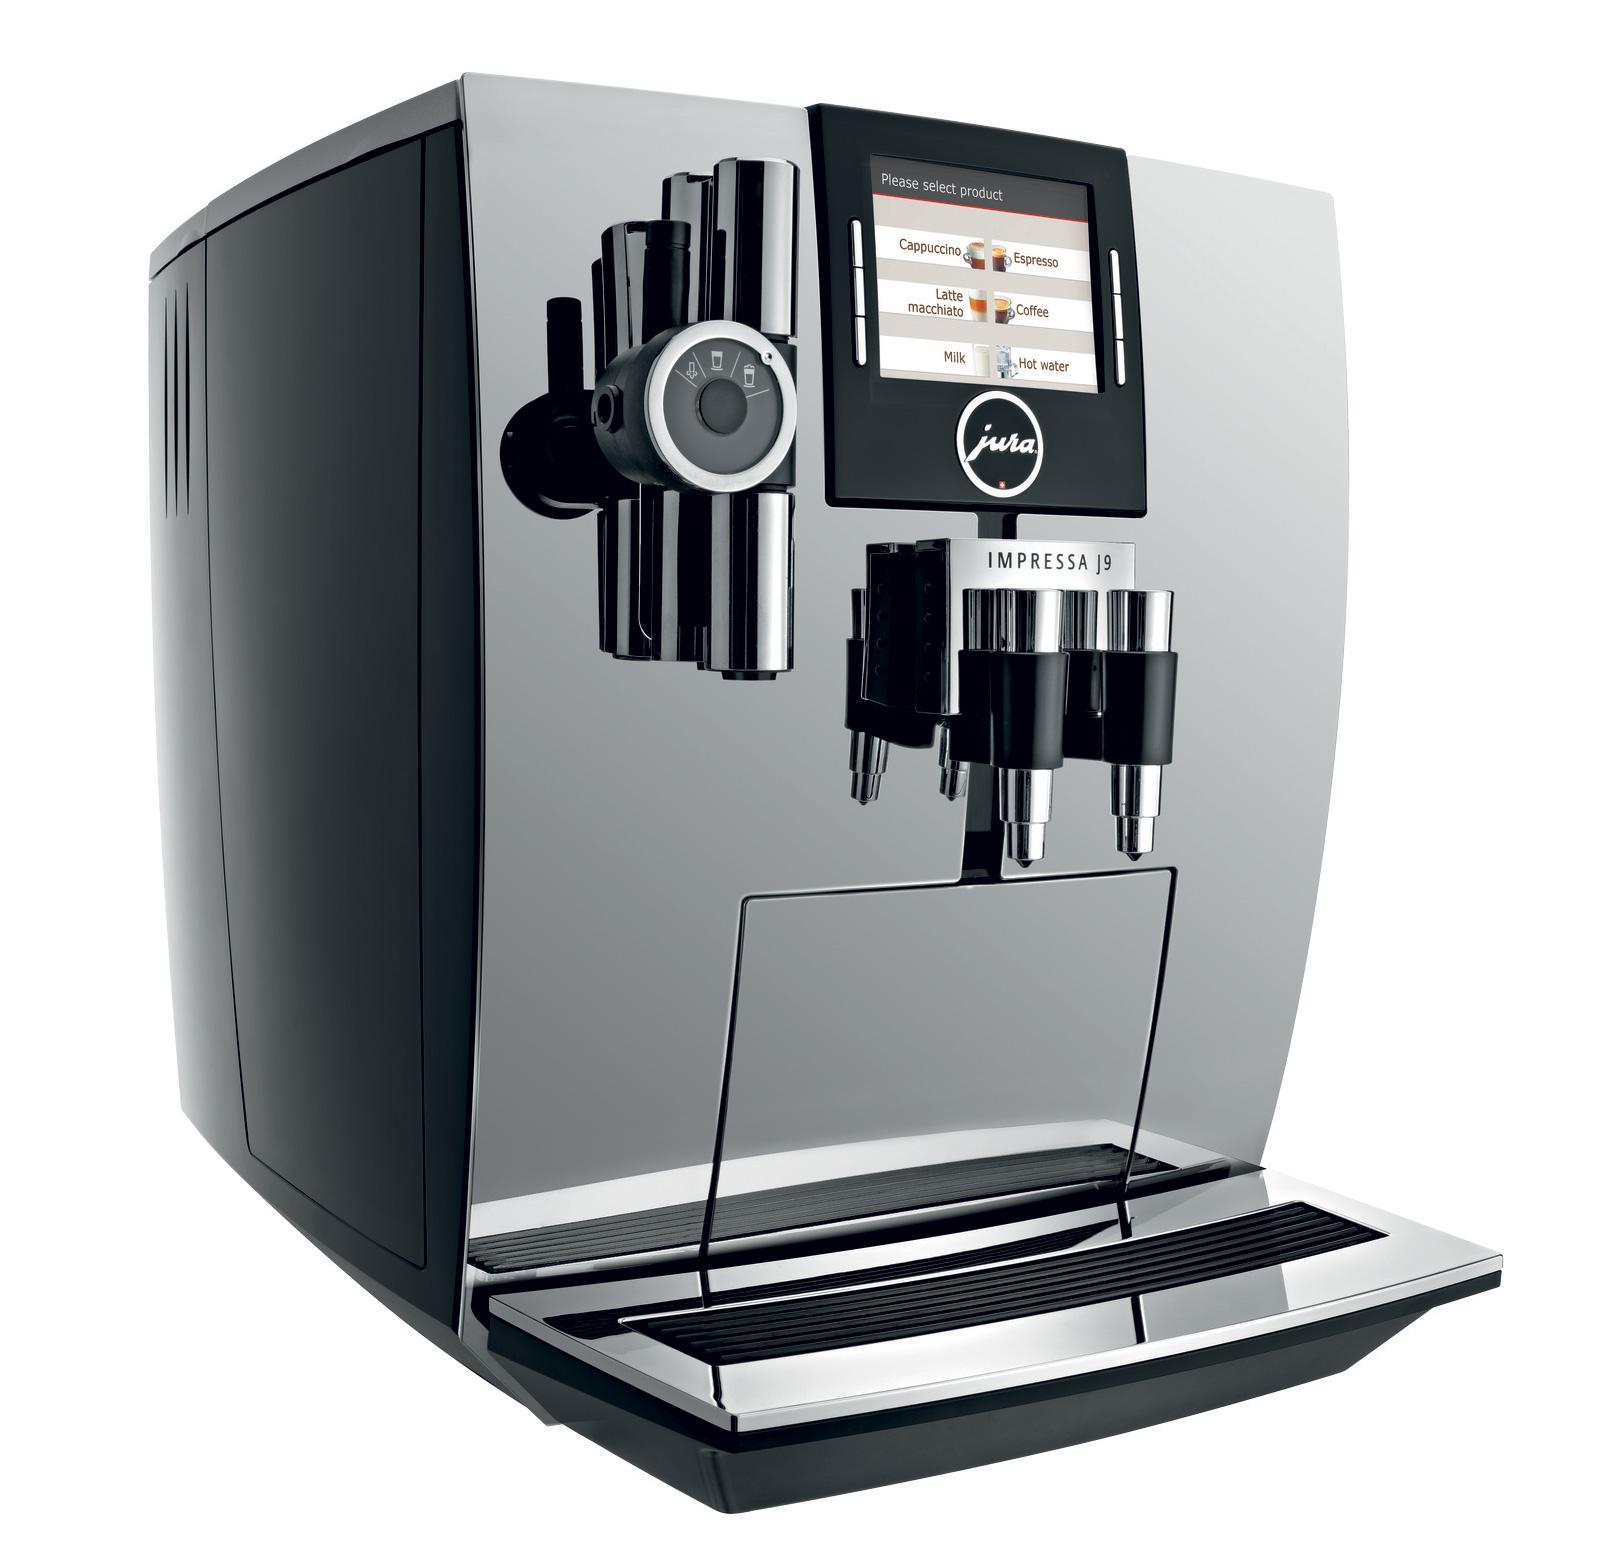 jura impressa j9 one touch tft chrome best espresso machine 1st in coffee 13673. Black Bedroom Furniture Sets. Home Design Ideas